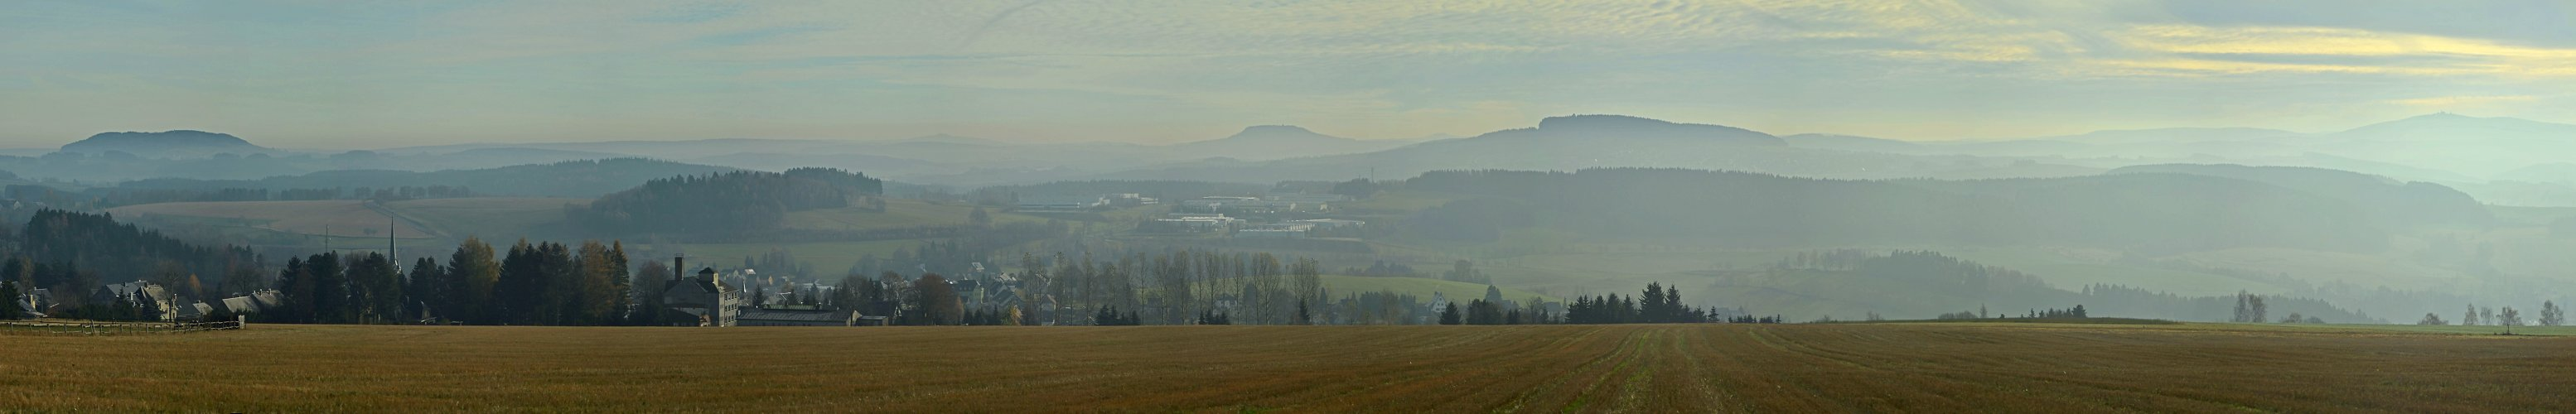 Erzgebirge im November